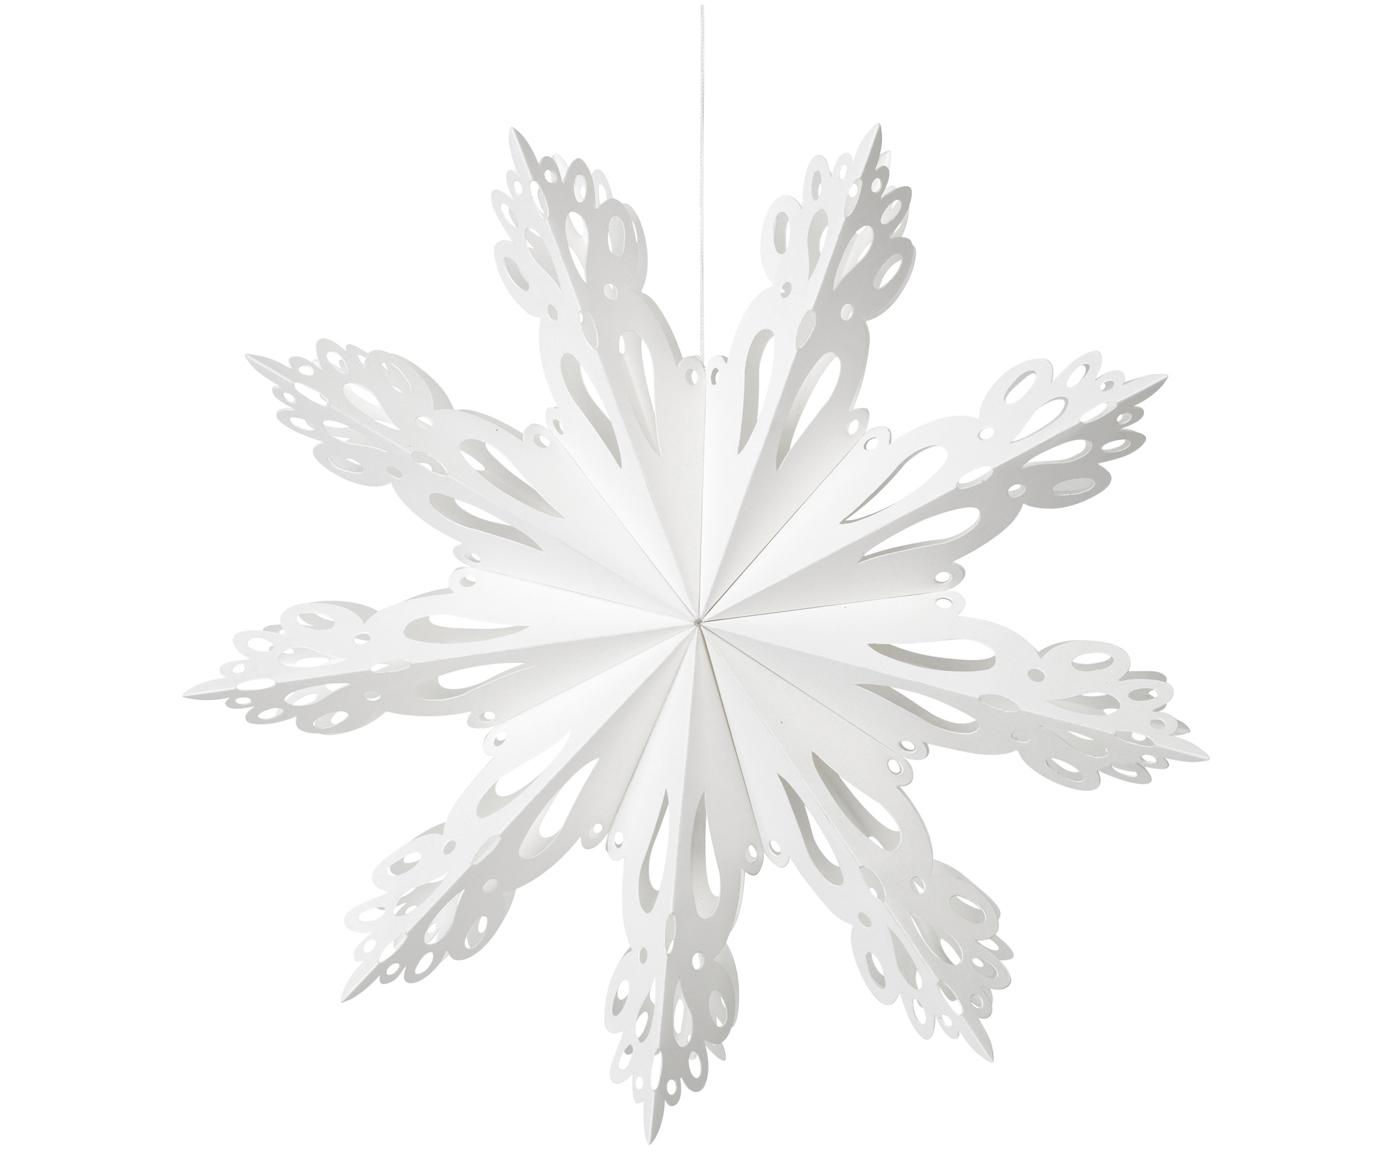 XL-kerstboomhanger Snowflake, Papier, Wit, Ø 30 cm